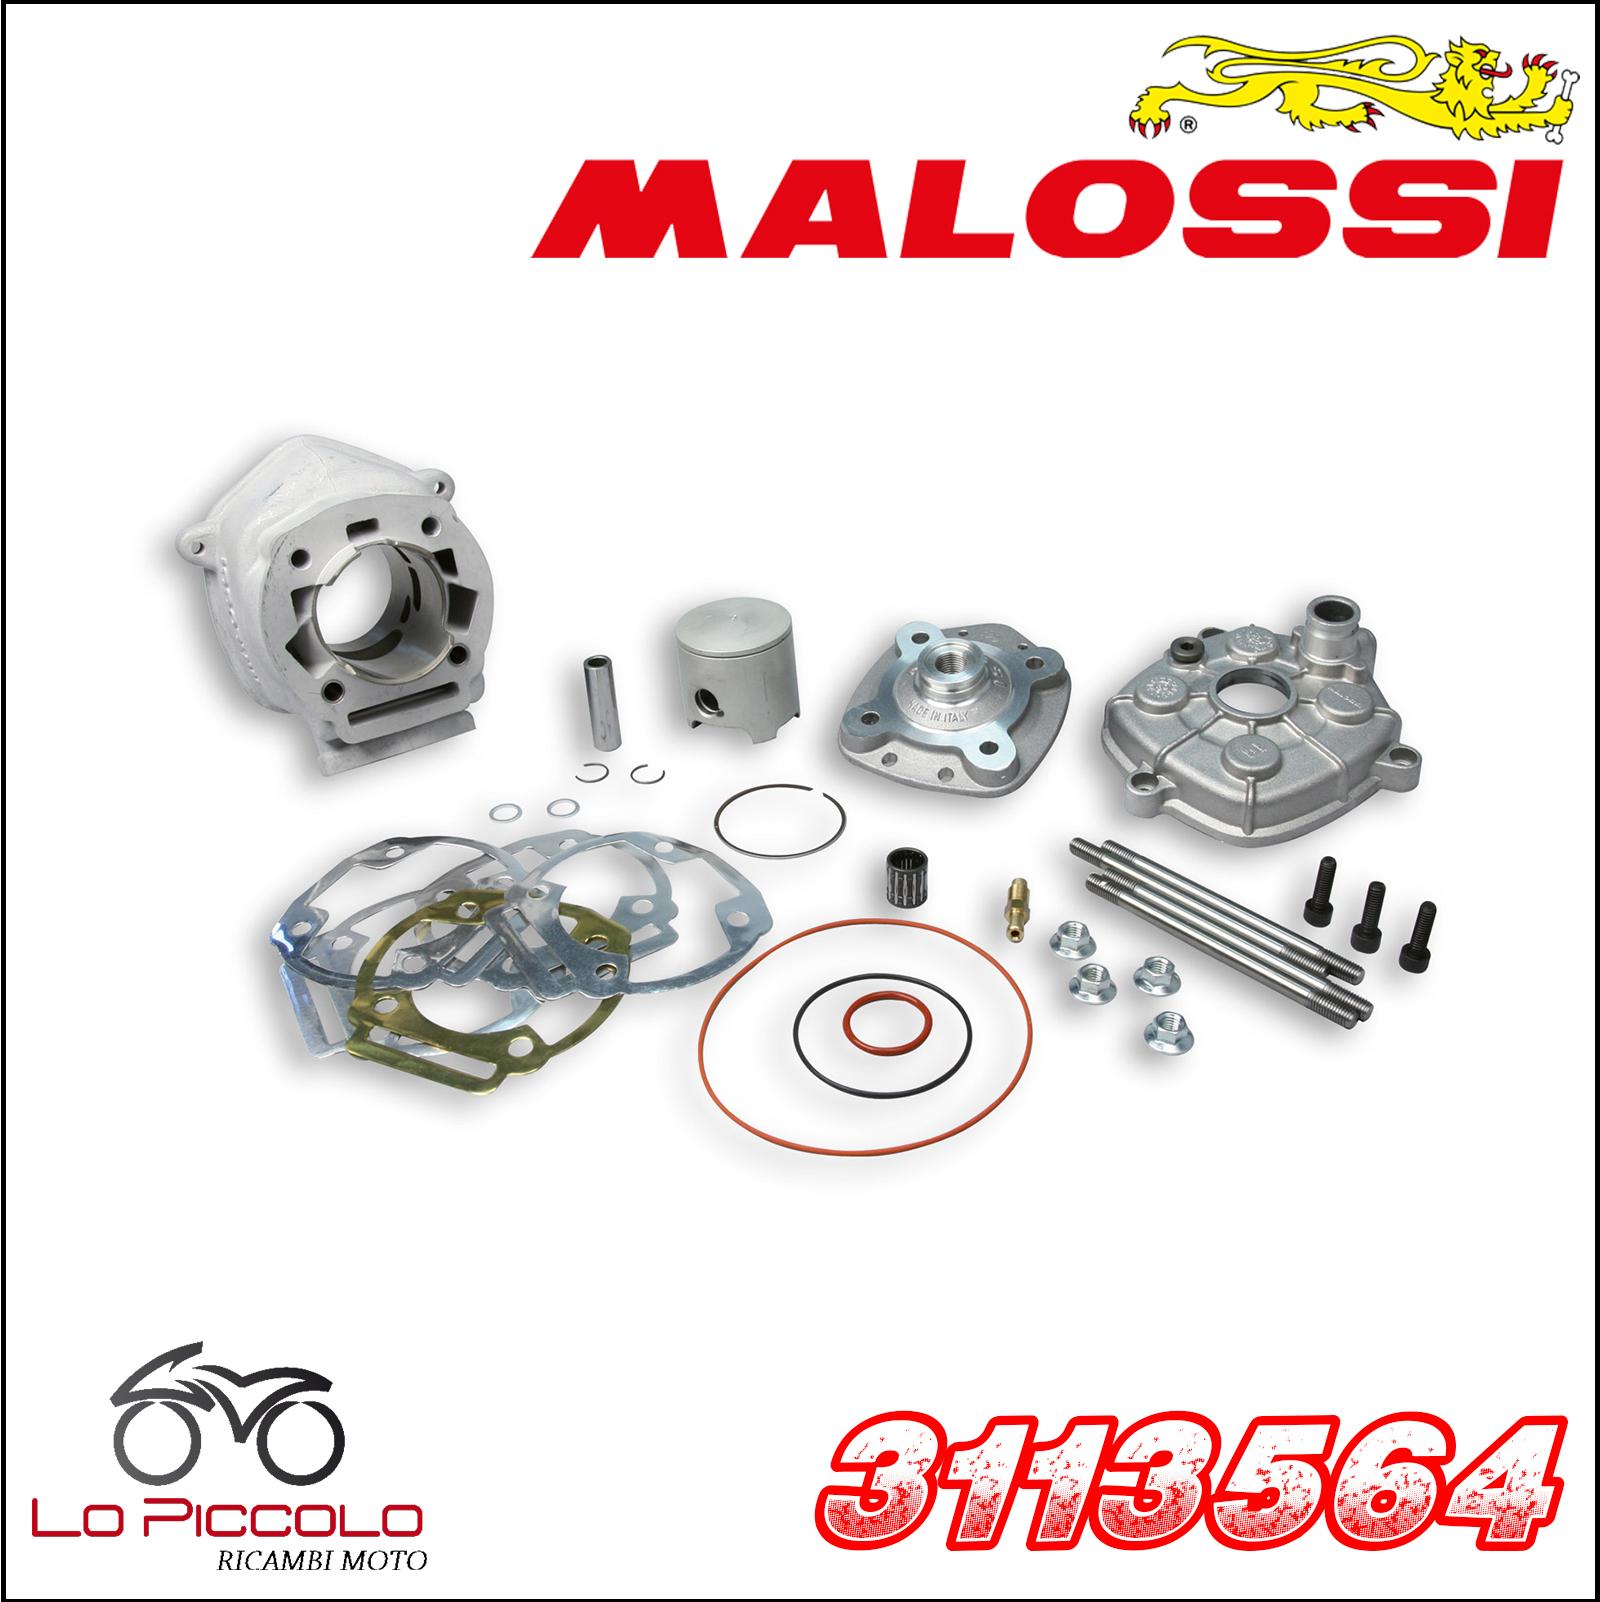 3112147 malossi Thermal Group Ø 39.88 Aluminium gilera gsm